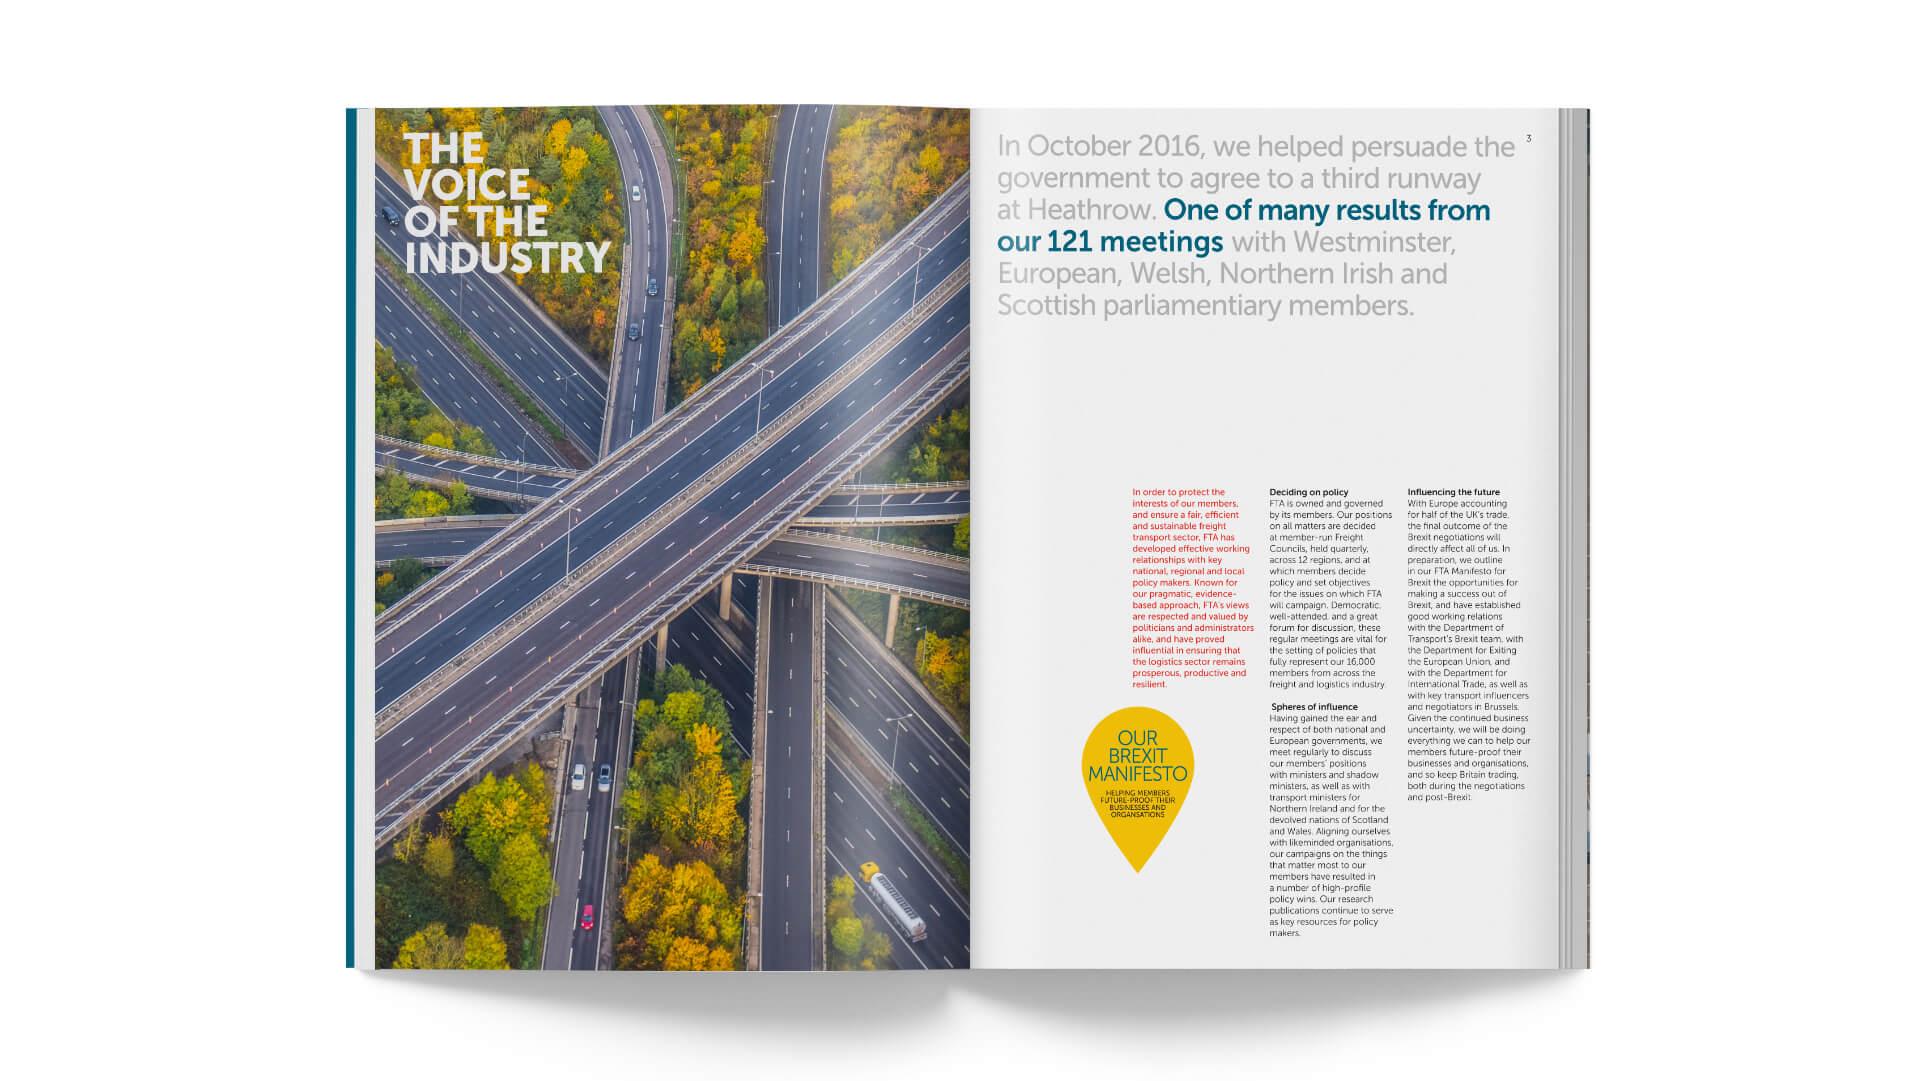 Freight transport association fta corporate brochure brand positioning